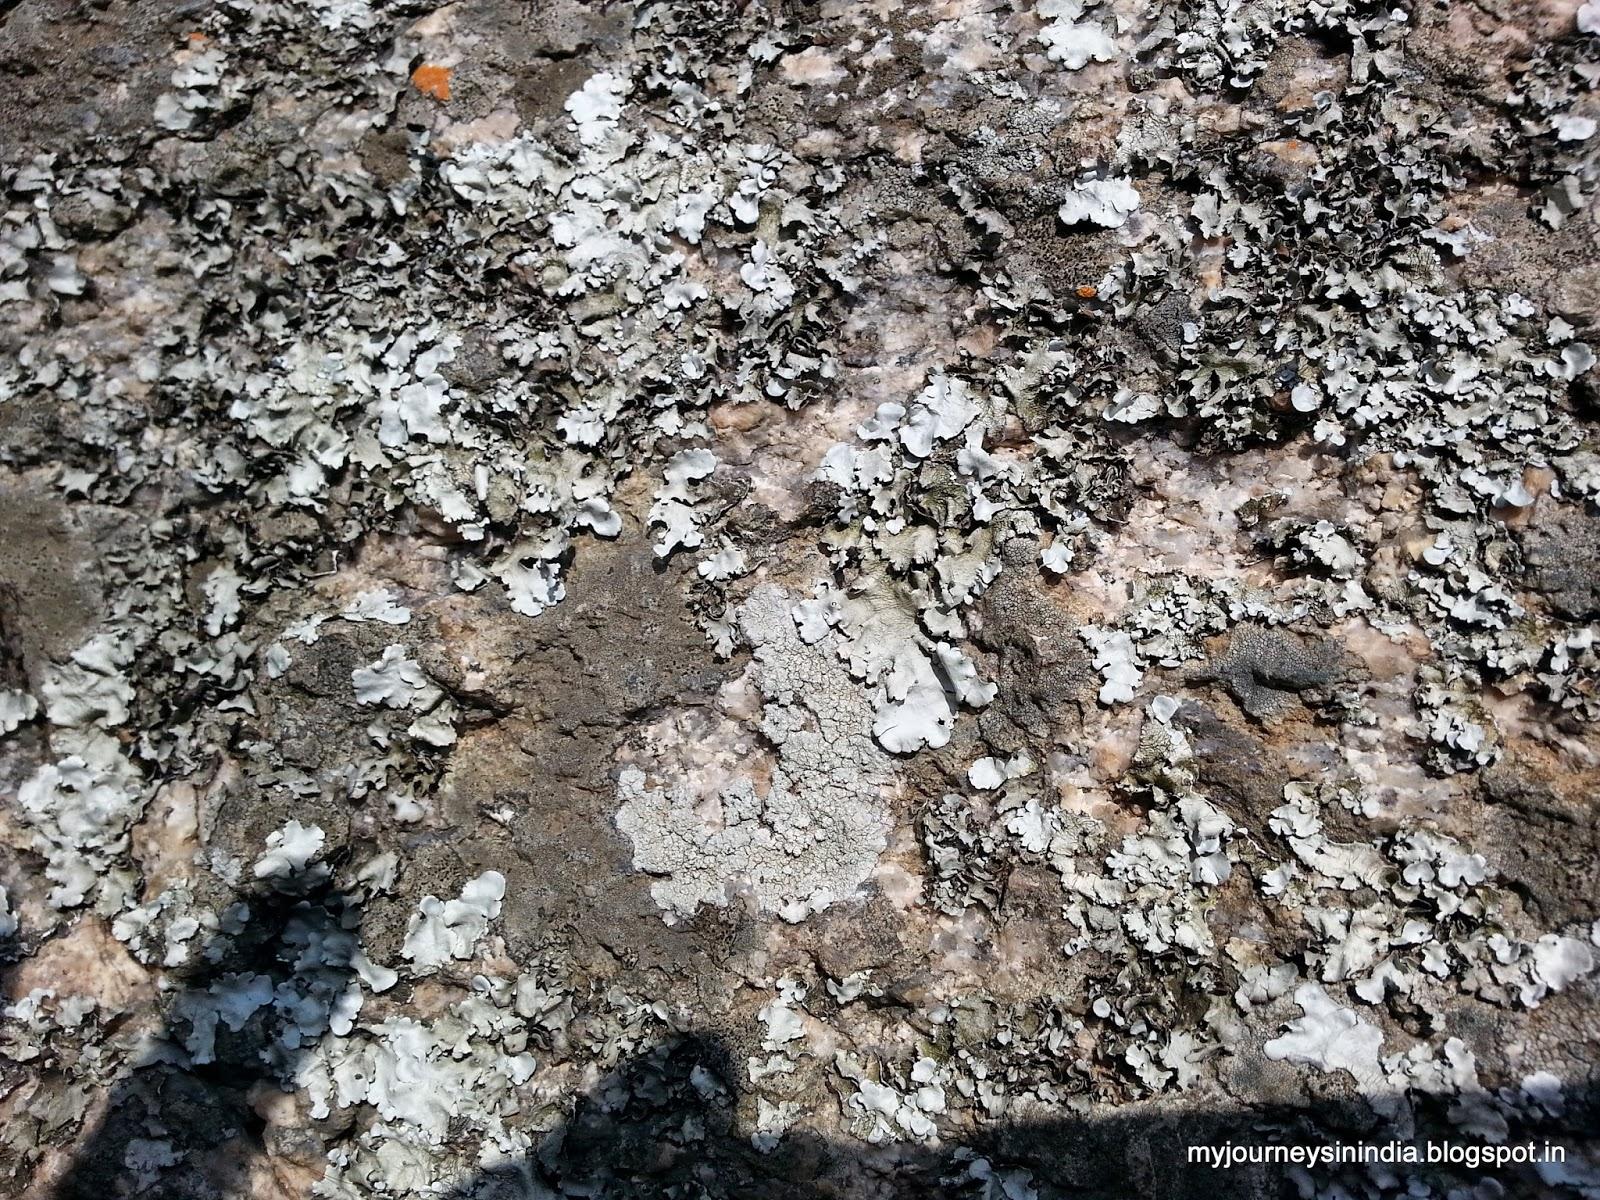 Lichens growing on rocks Devarayanadurga